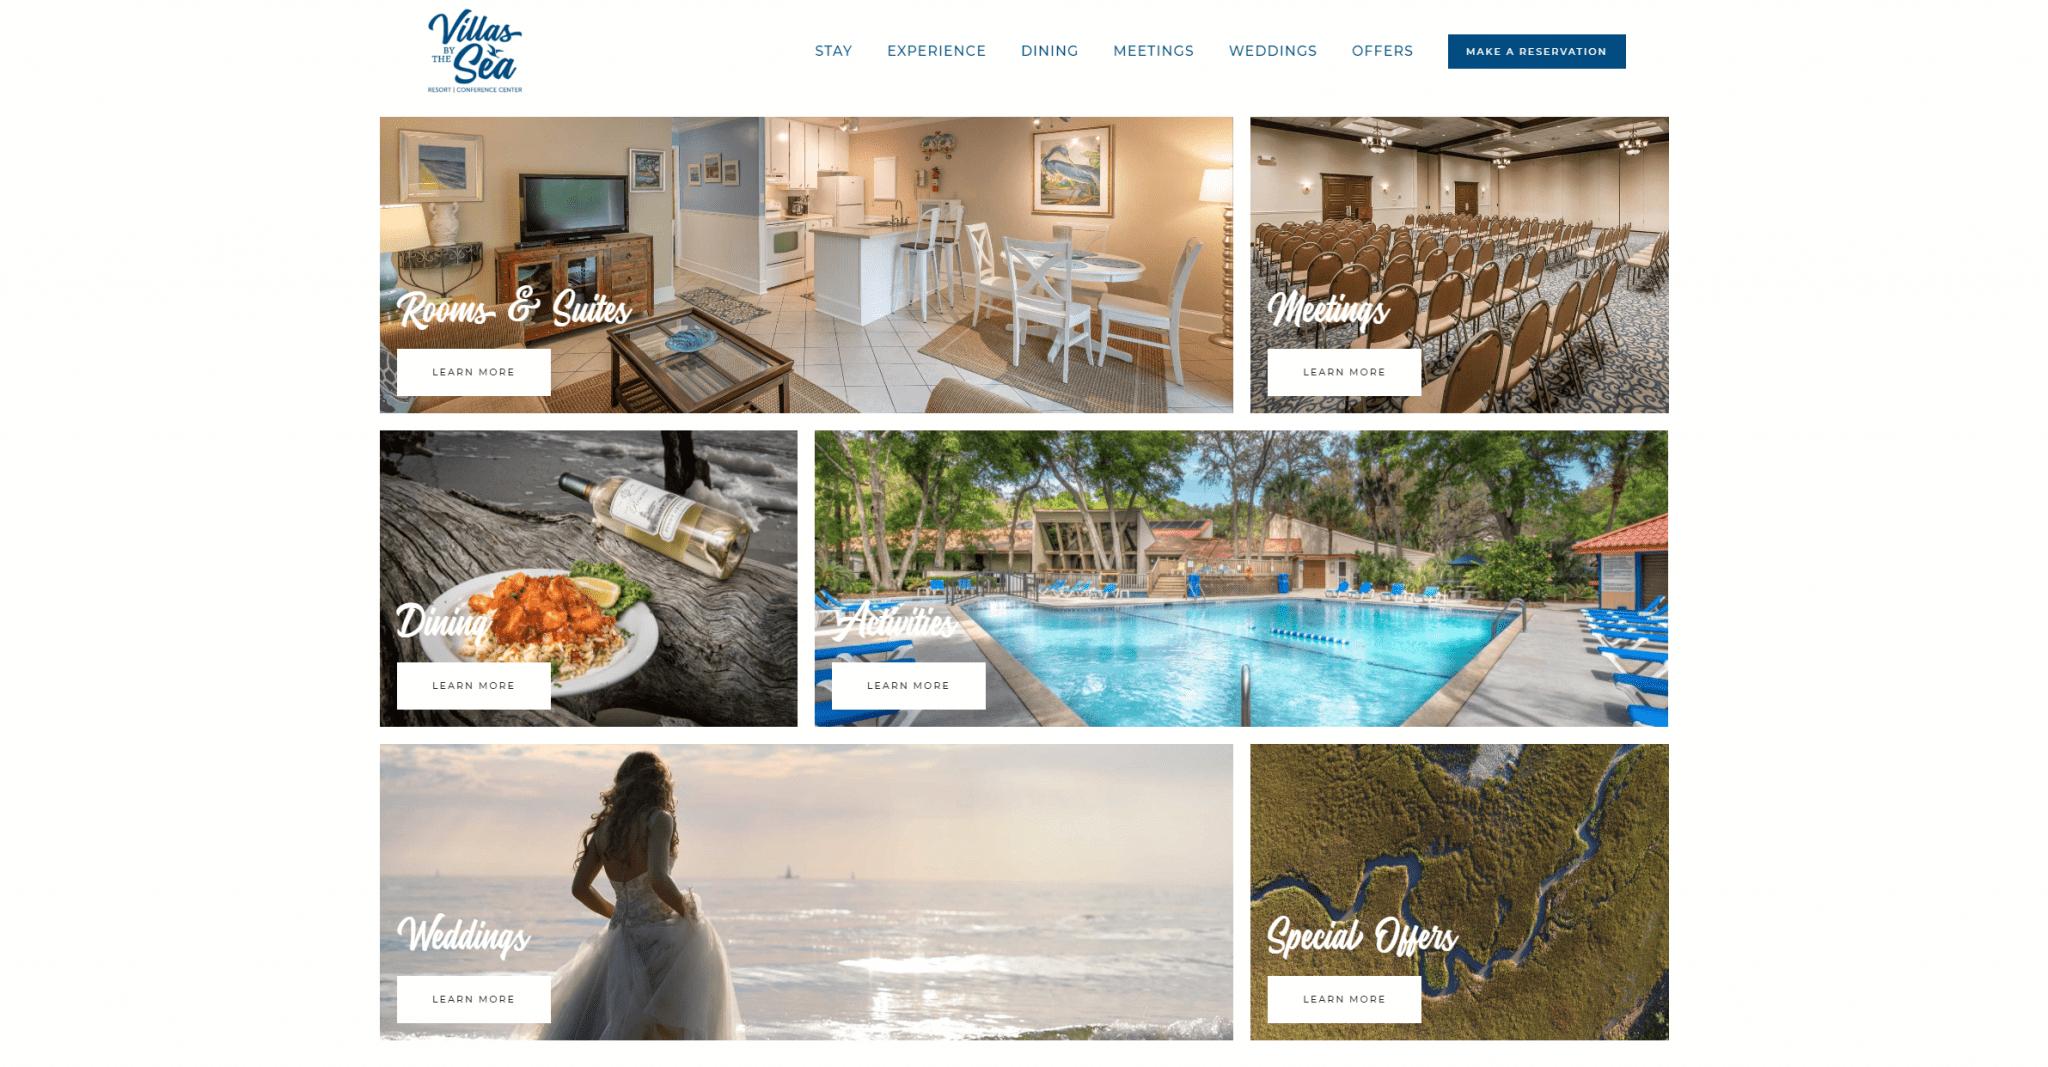 https___villasbythesearesort.com_ Villas by the Sea – Making You Feel at Home_002